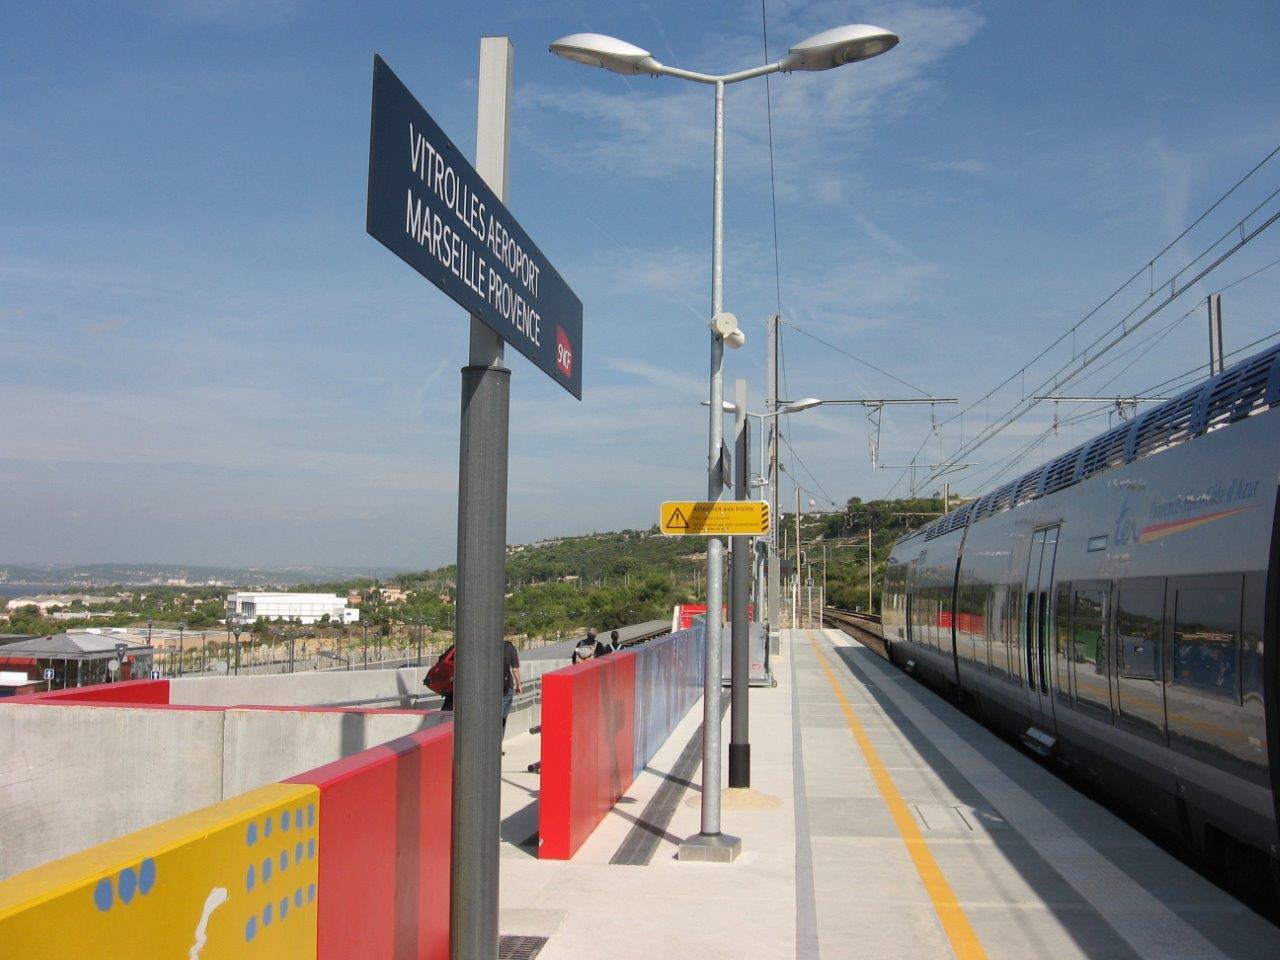 gare-de-vitrolles-aeroport-marseille-provence-train-station